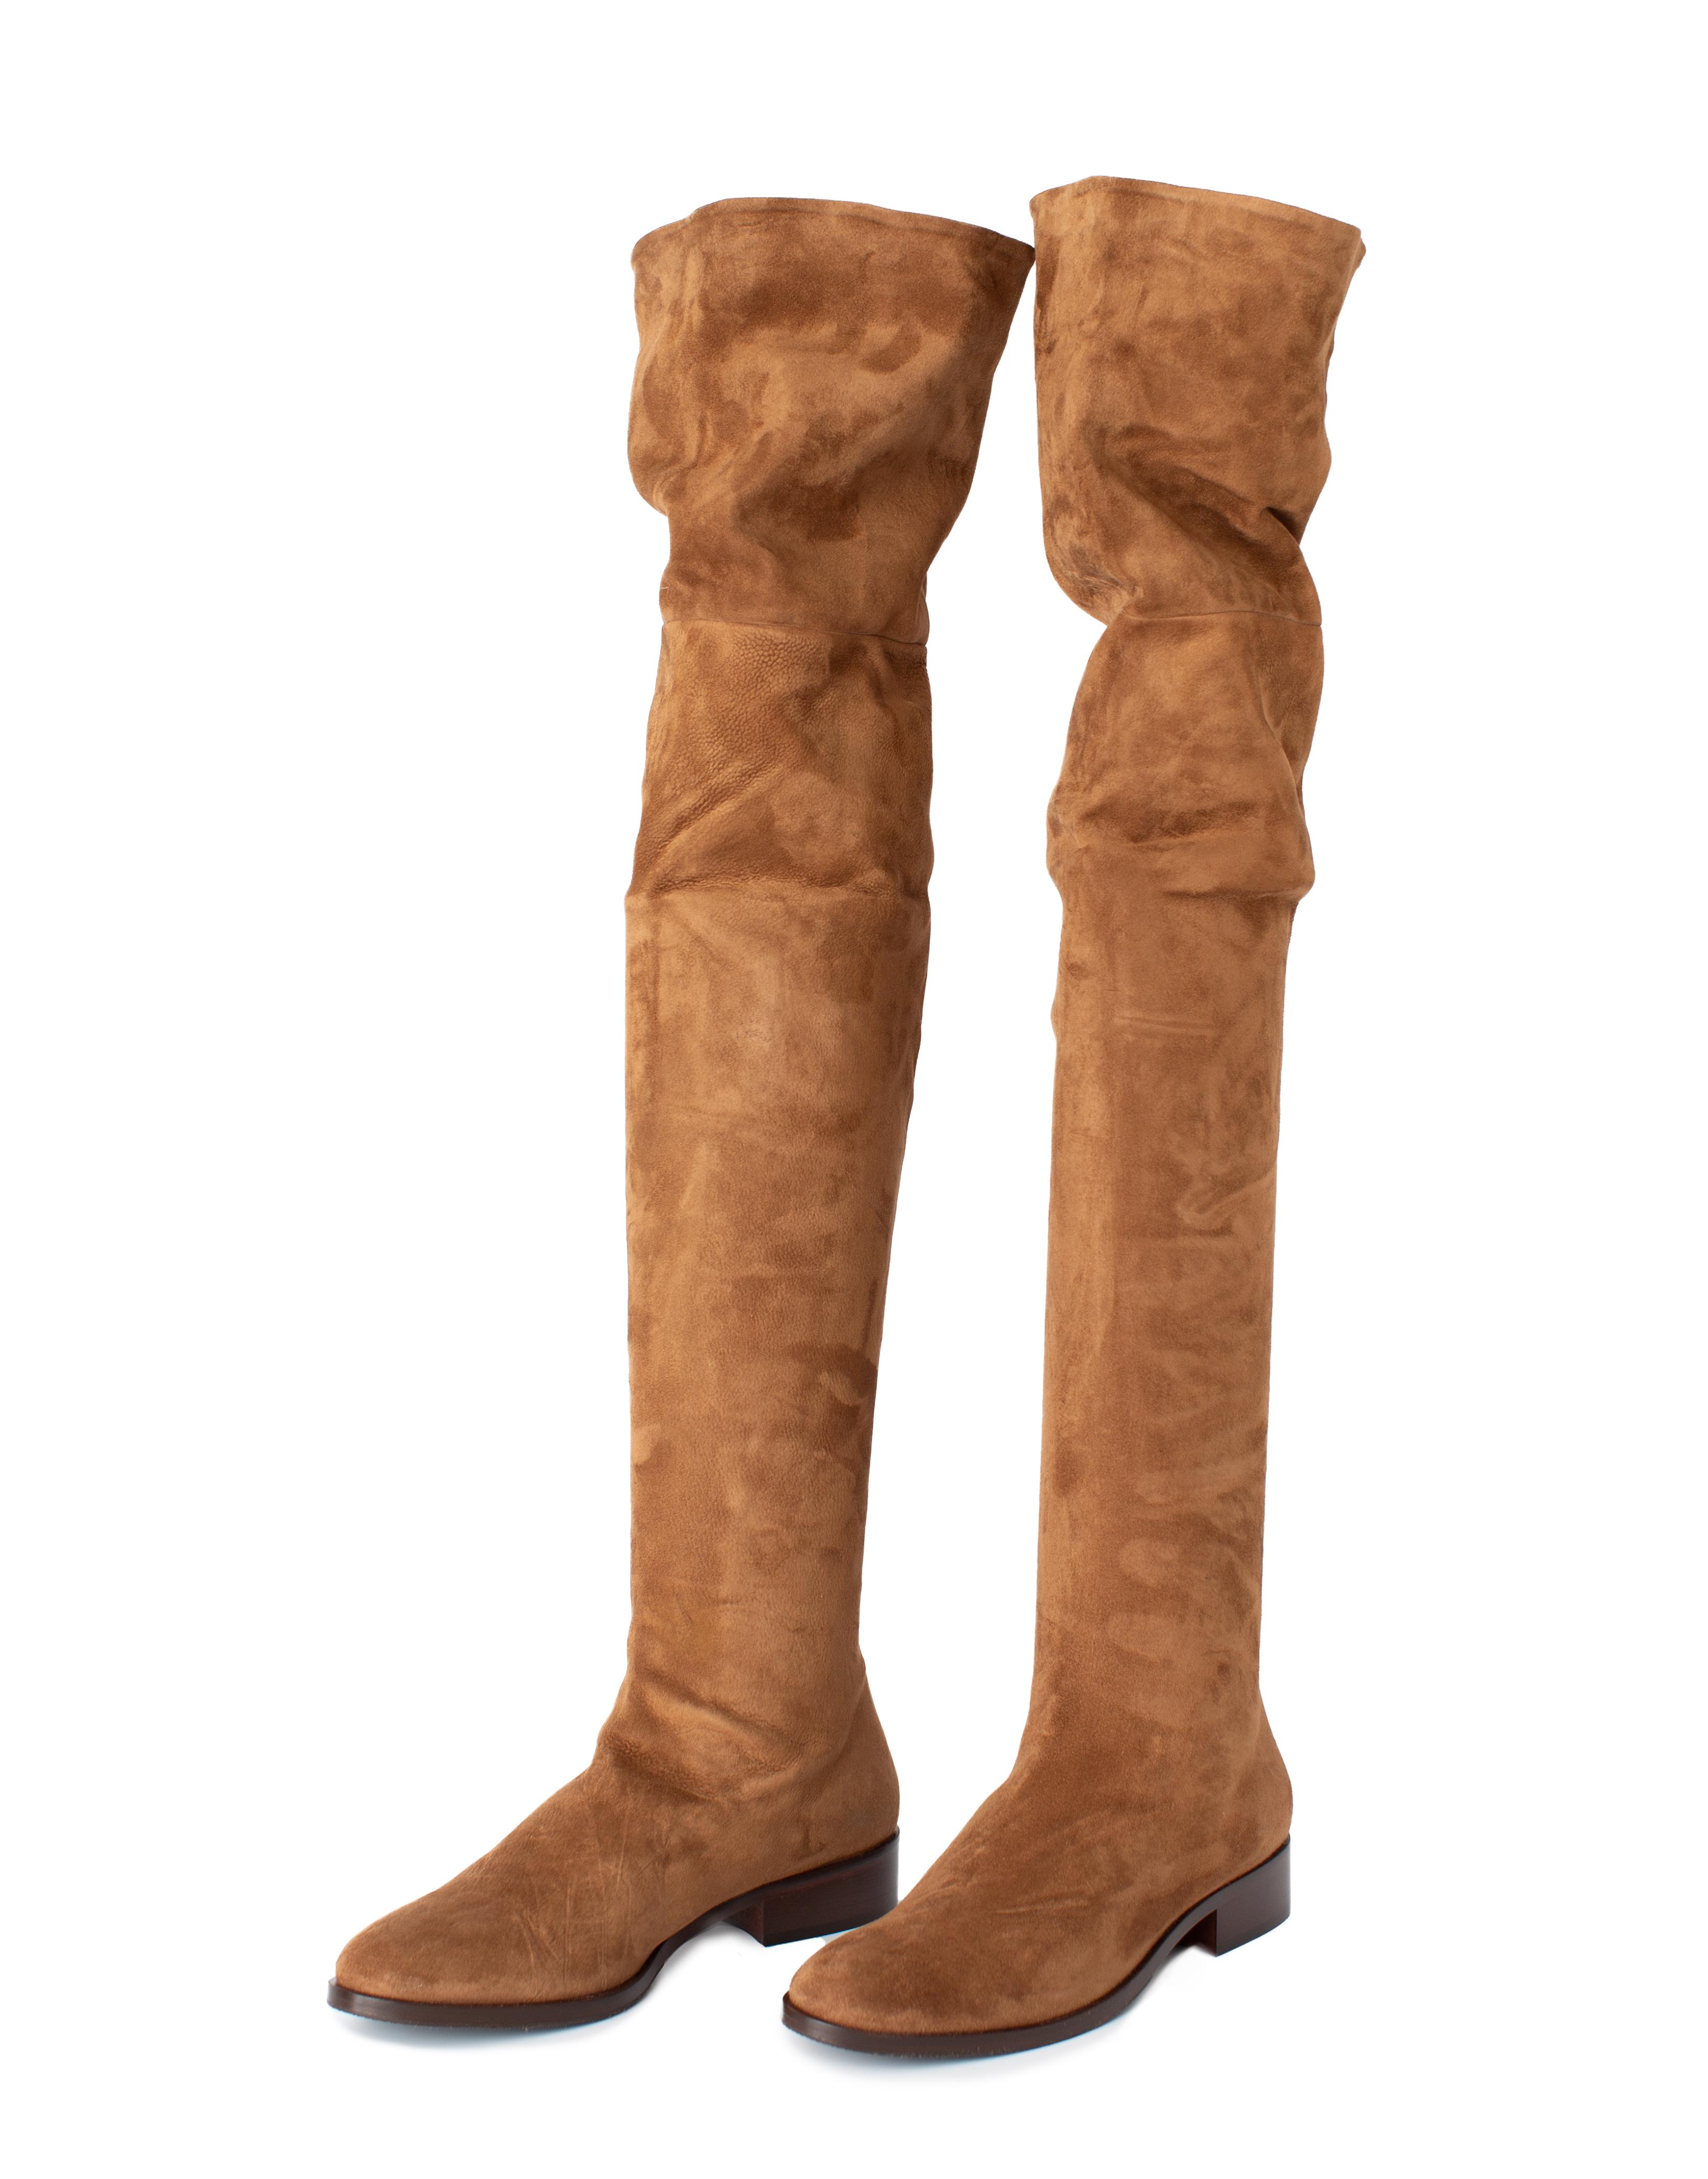 Overknee Boots Suede Leather